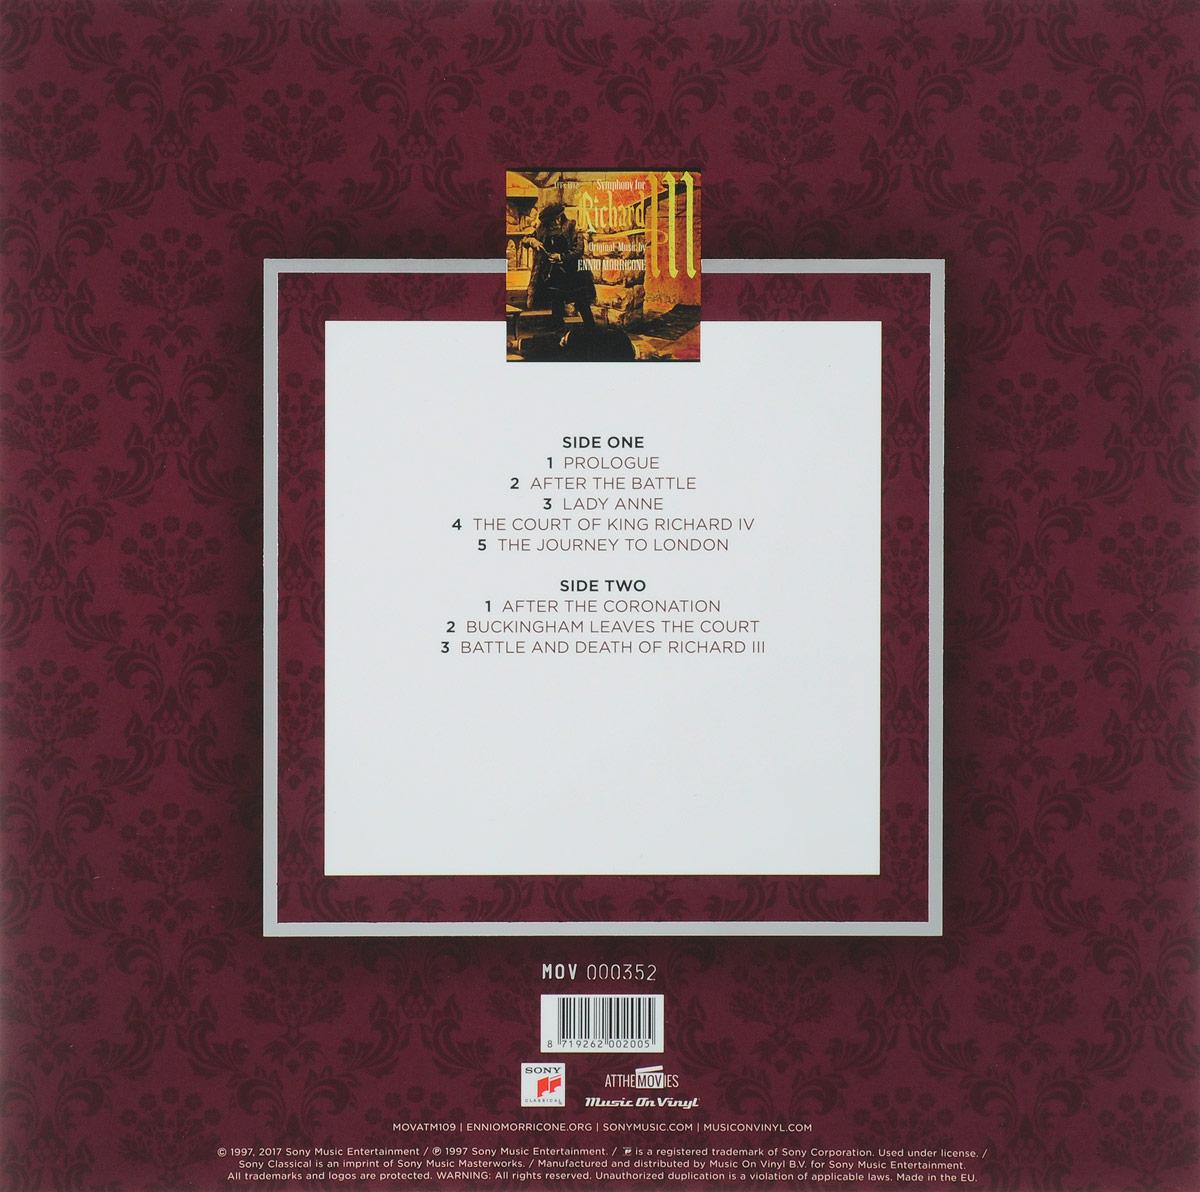 Ennio Morricone.  Symphony For Richard III (LP) Sony Music Entertainment, Inc.